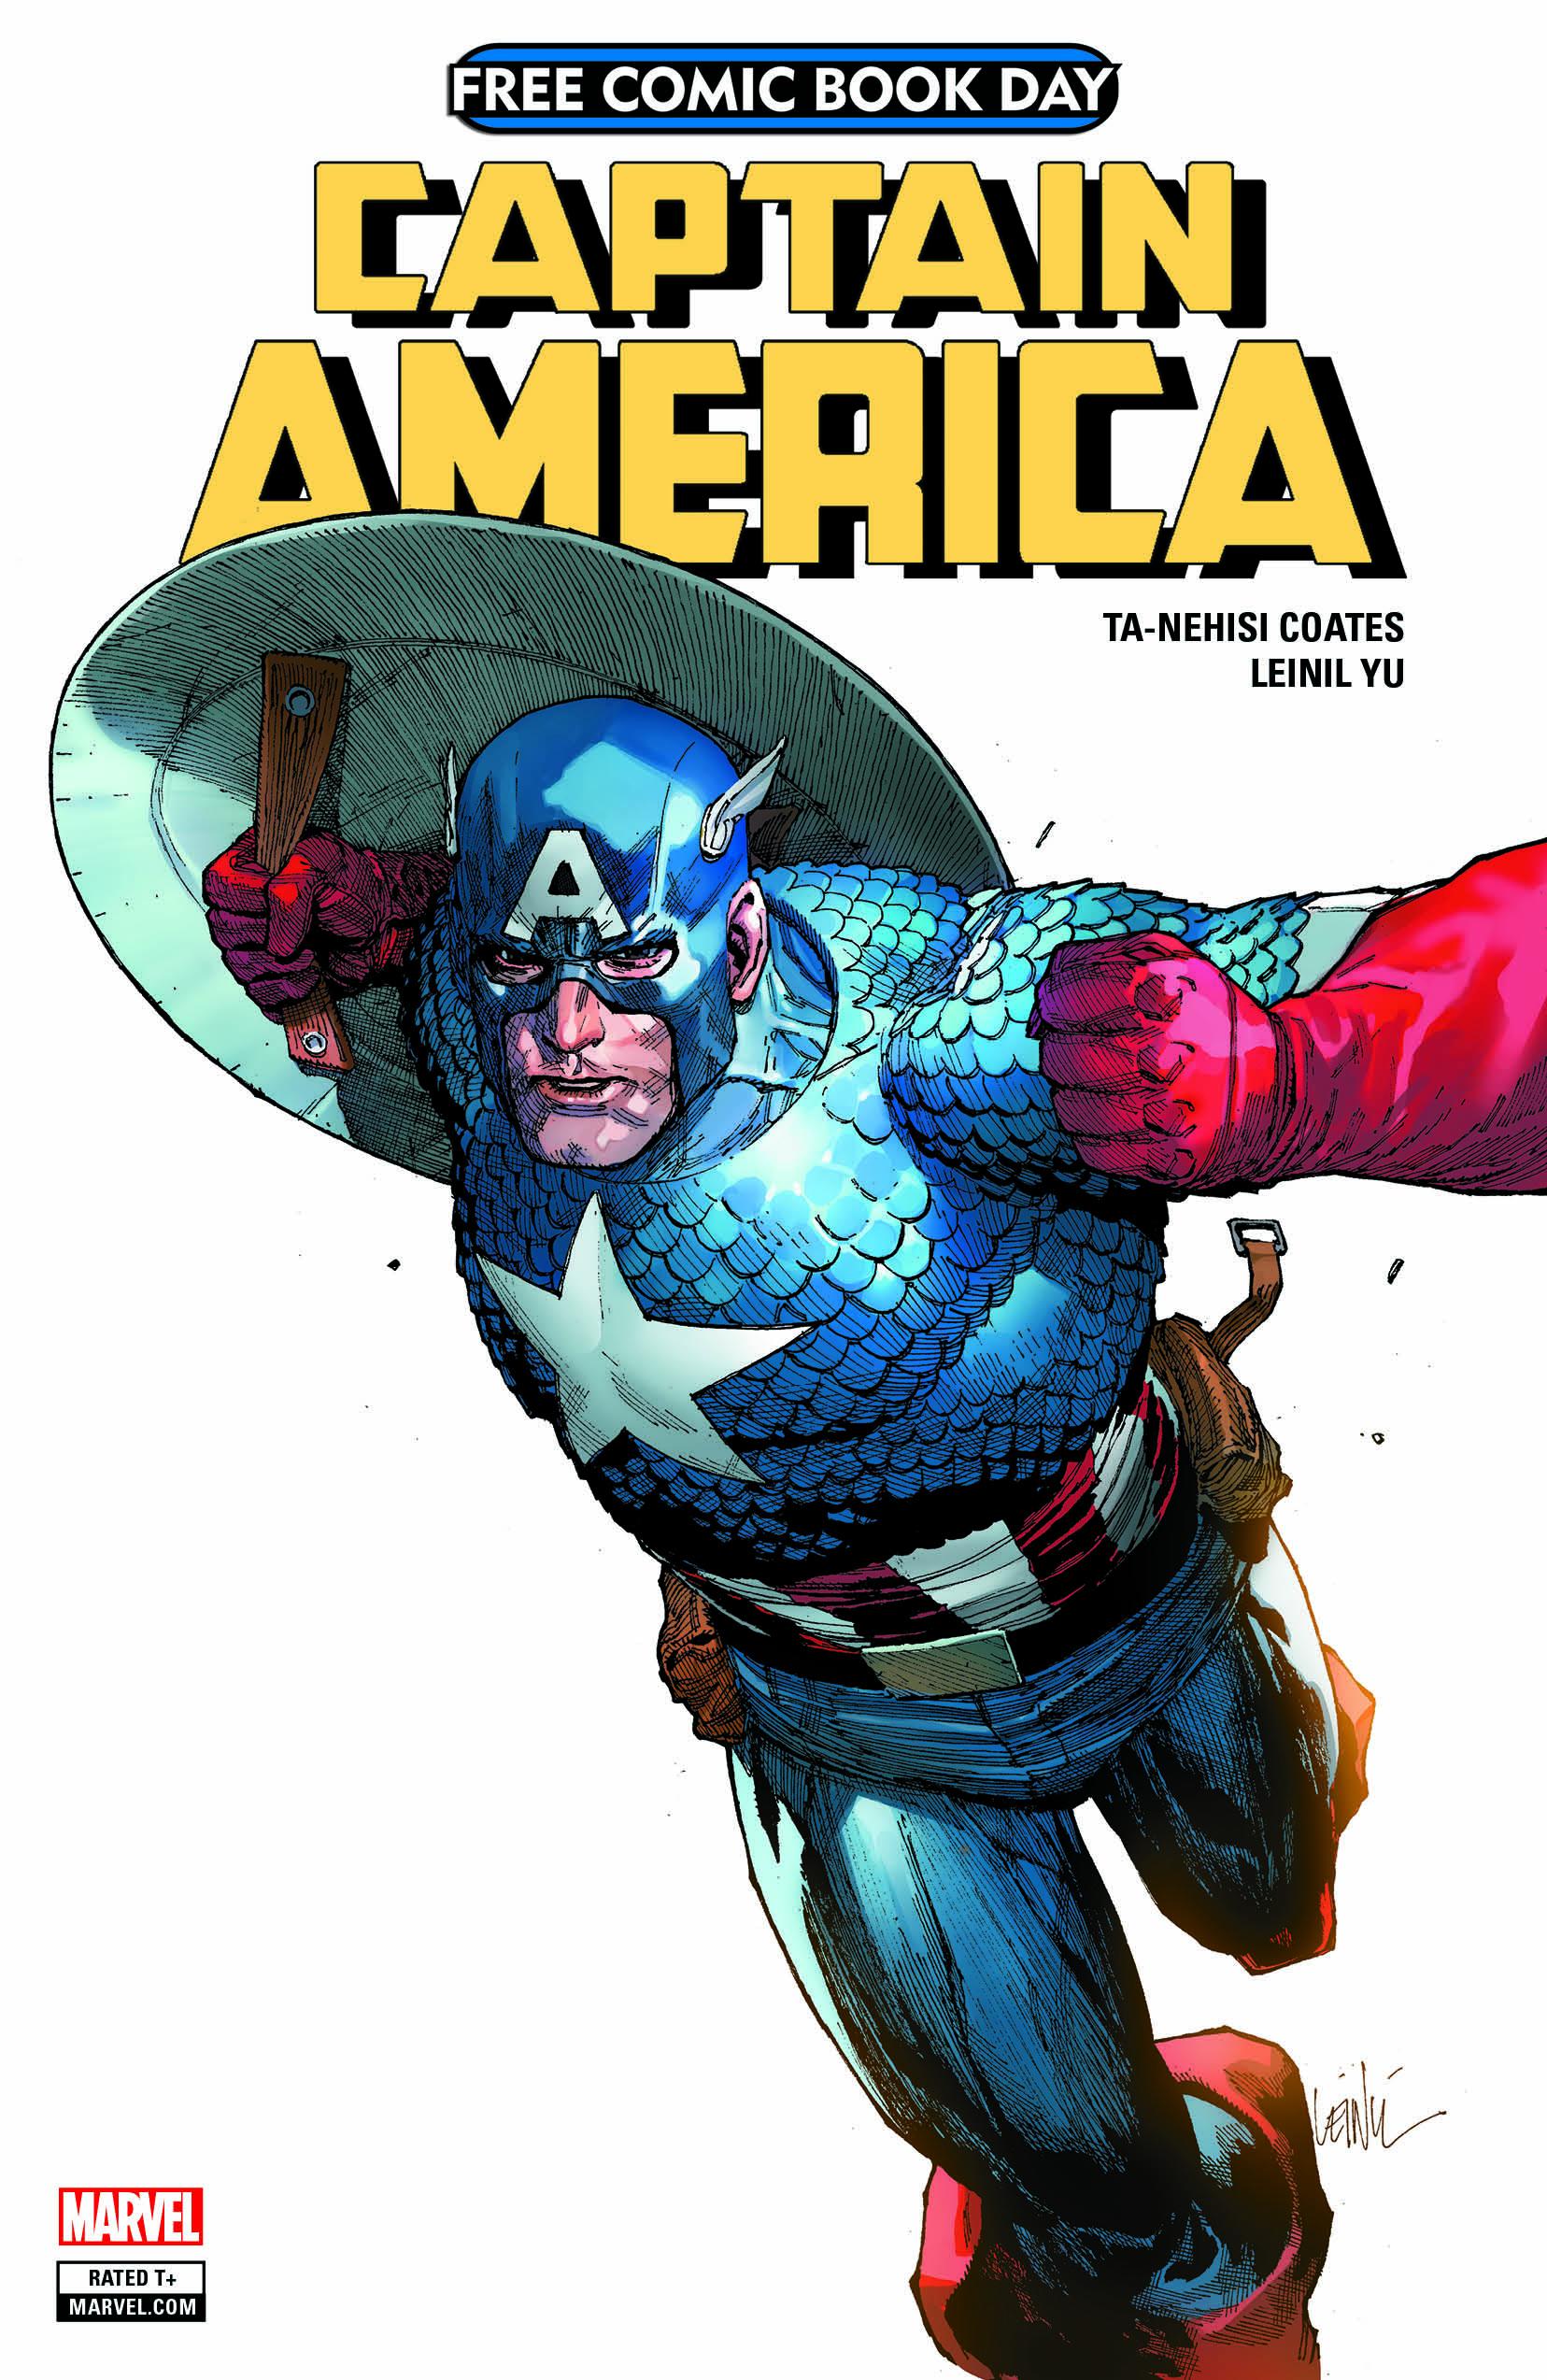 Captain America FCBD 2018